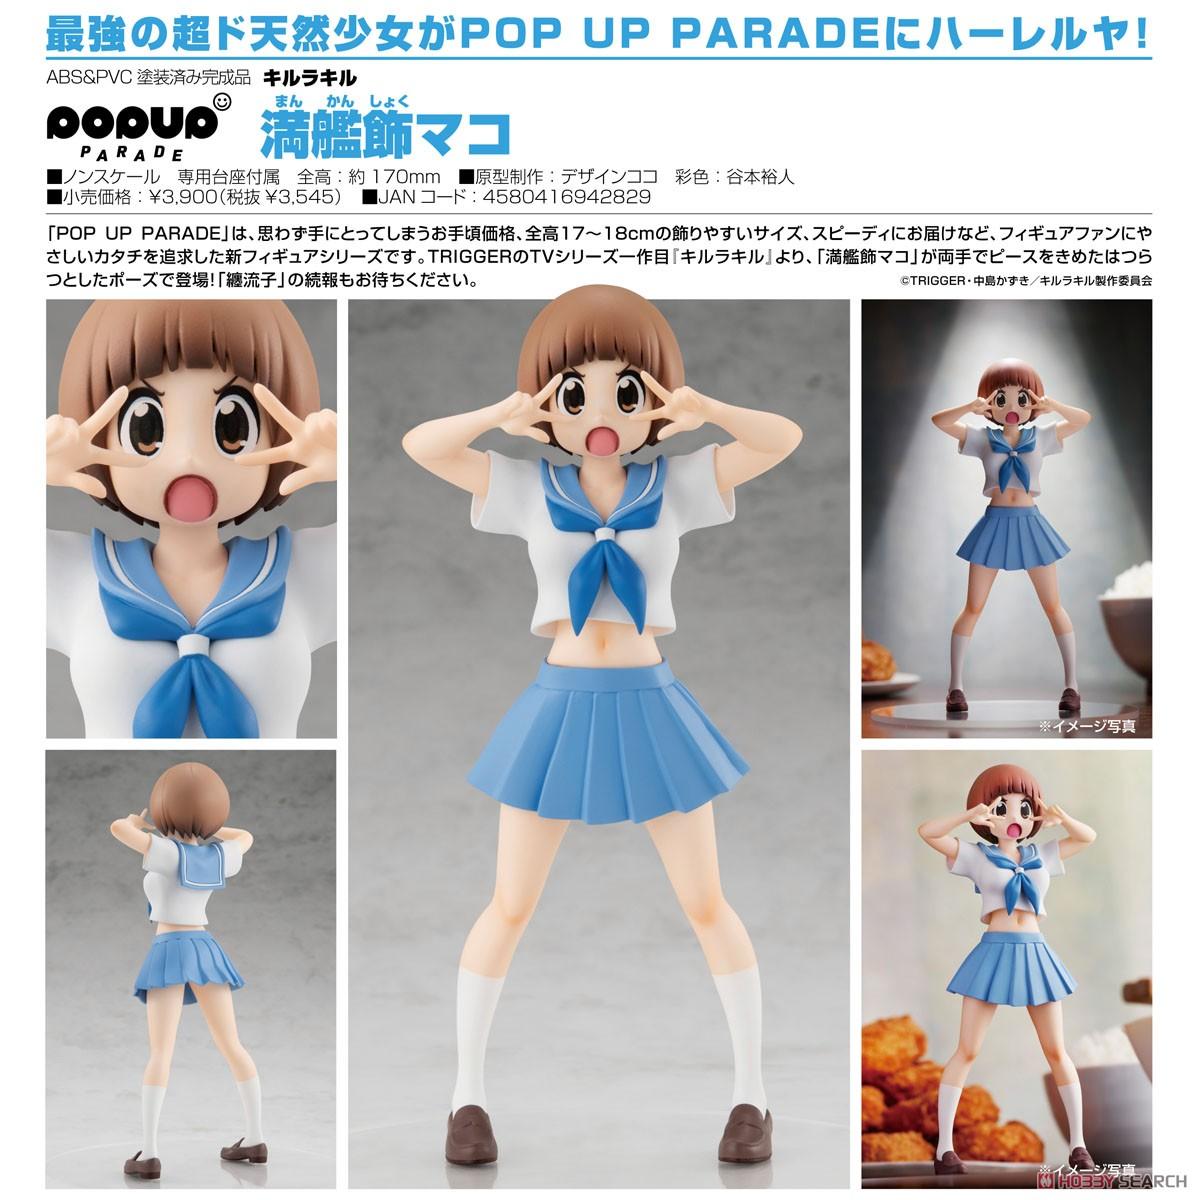 POP UP PARADE『満艦飾マコ』キルラキル 完成品フィギュア-009